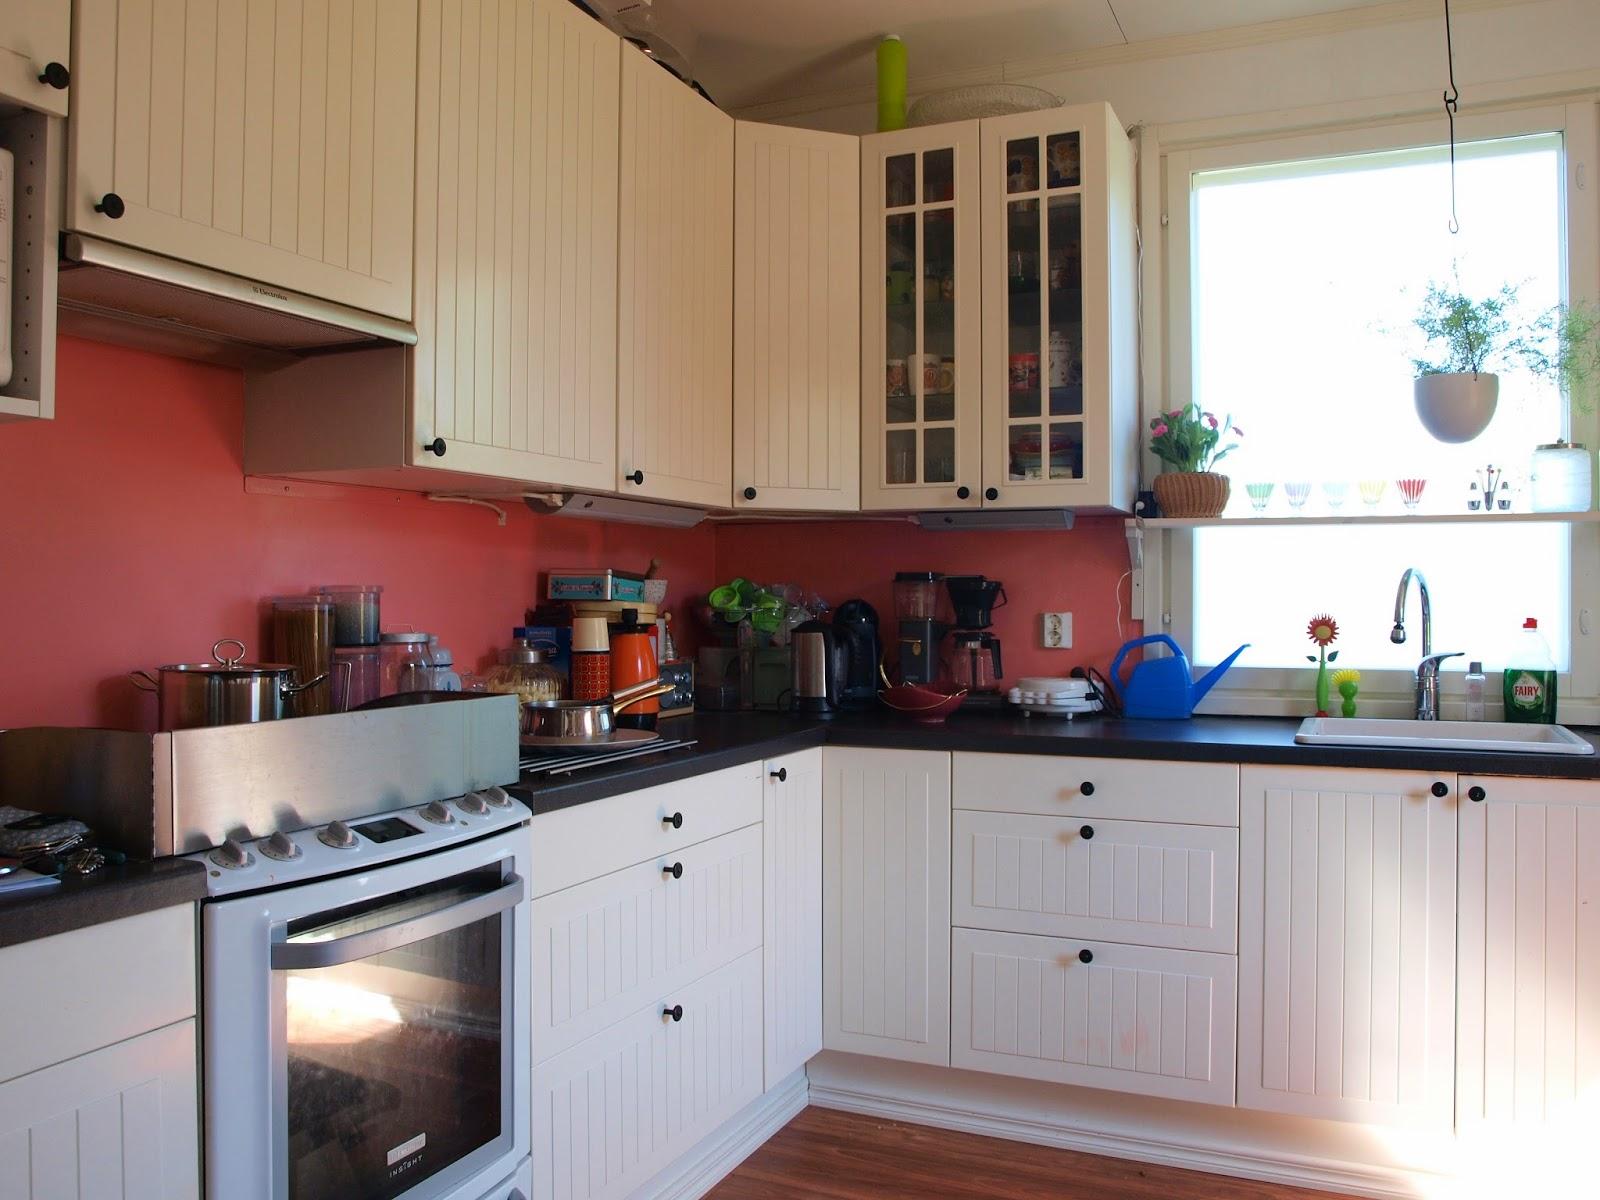 Ikea kitchen pink vintage